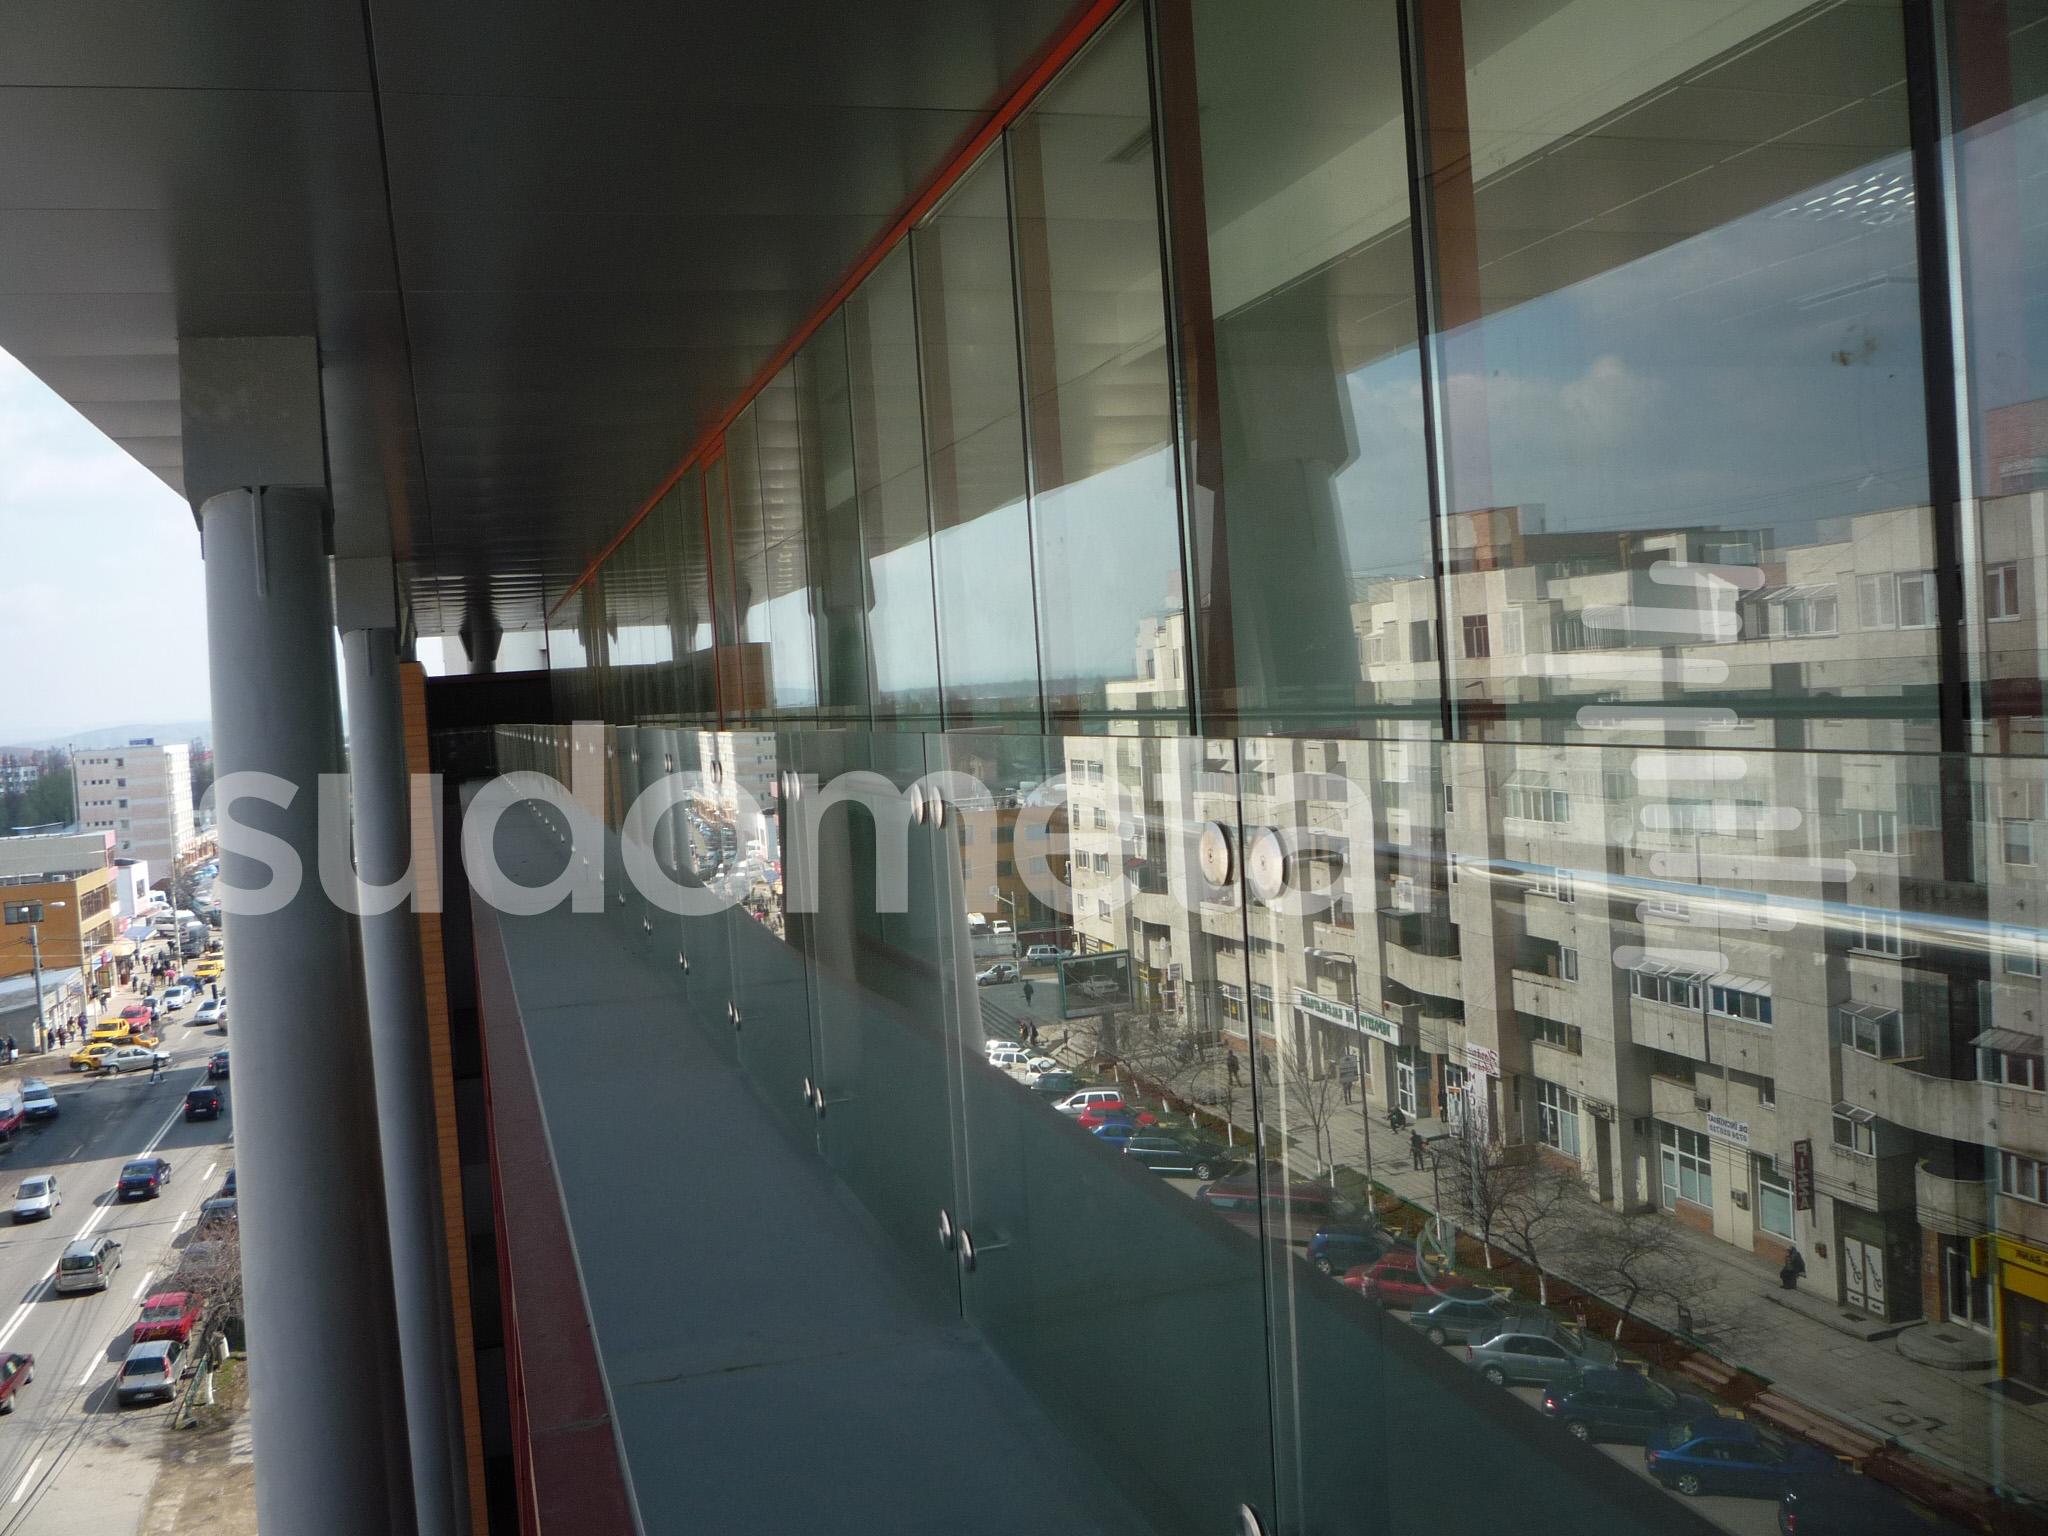 Balustrade exterioare - Balustrade cladire de birouri 30 Avenue, Bacau SUDOMETAL - Poza 4